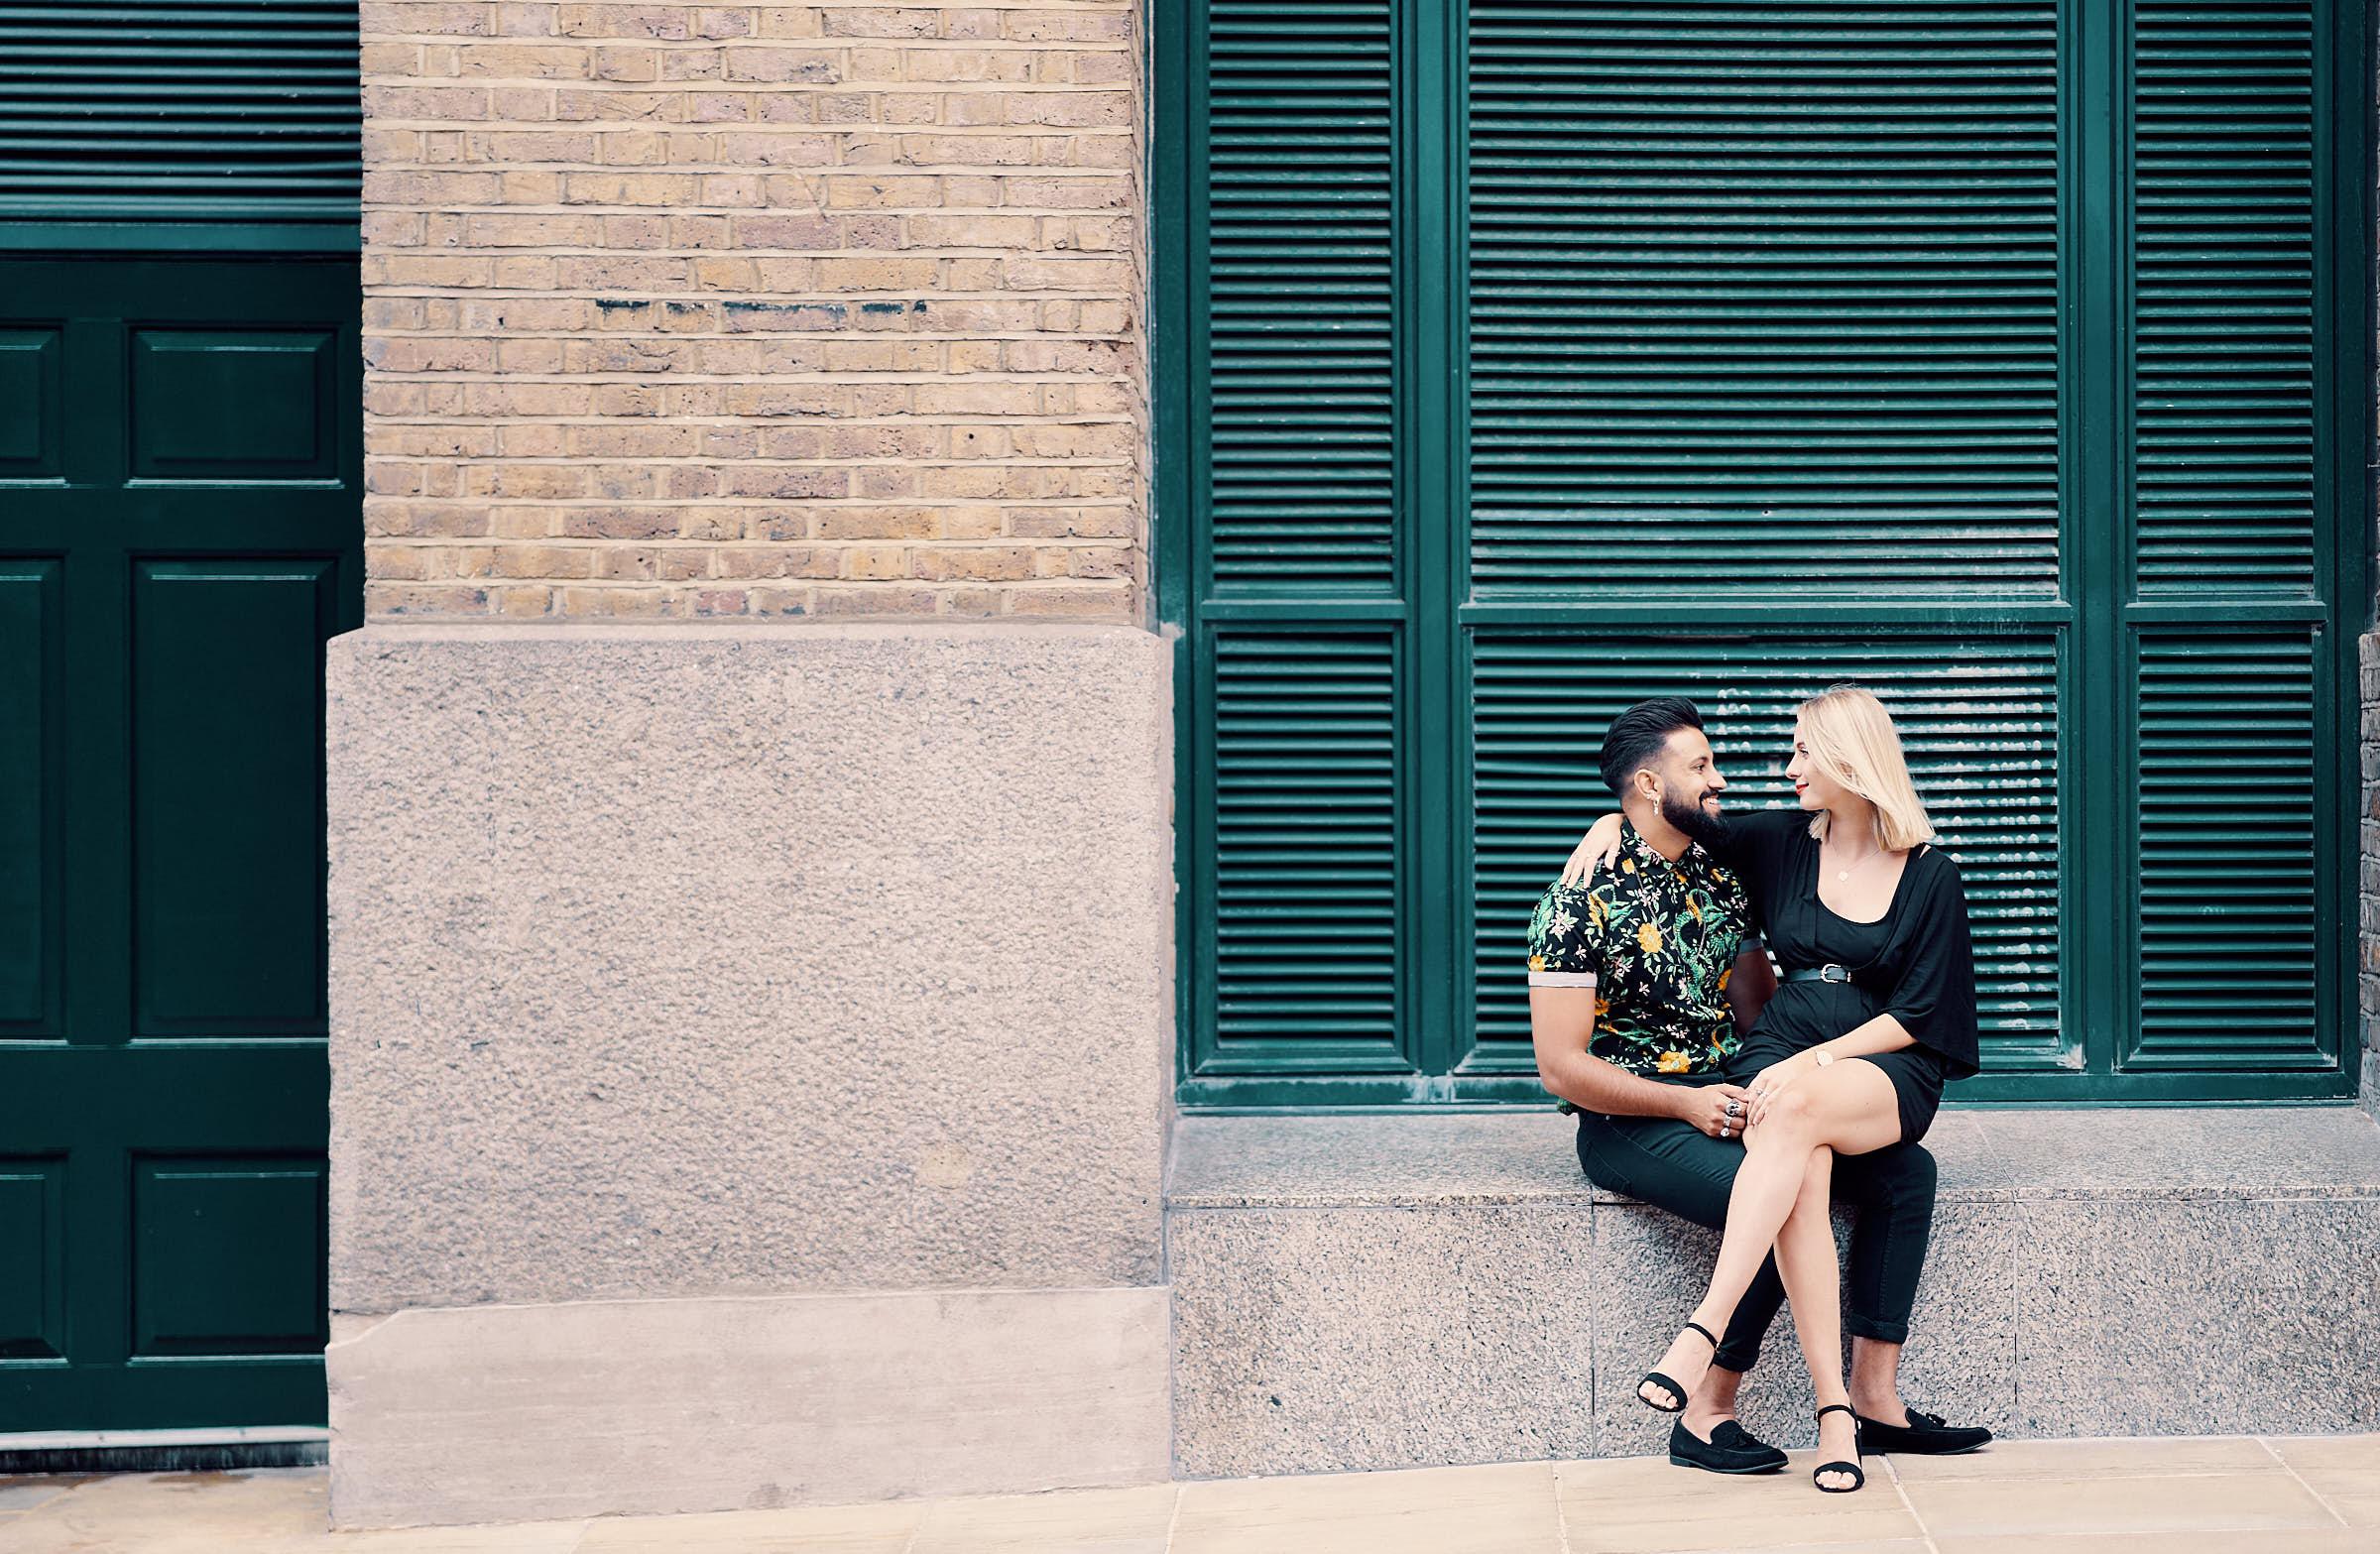 Sexy Couple Poses London City Photoshoot Photoshoot A Few Good Clicks